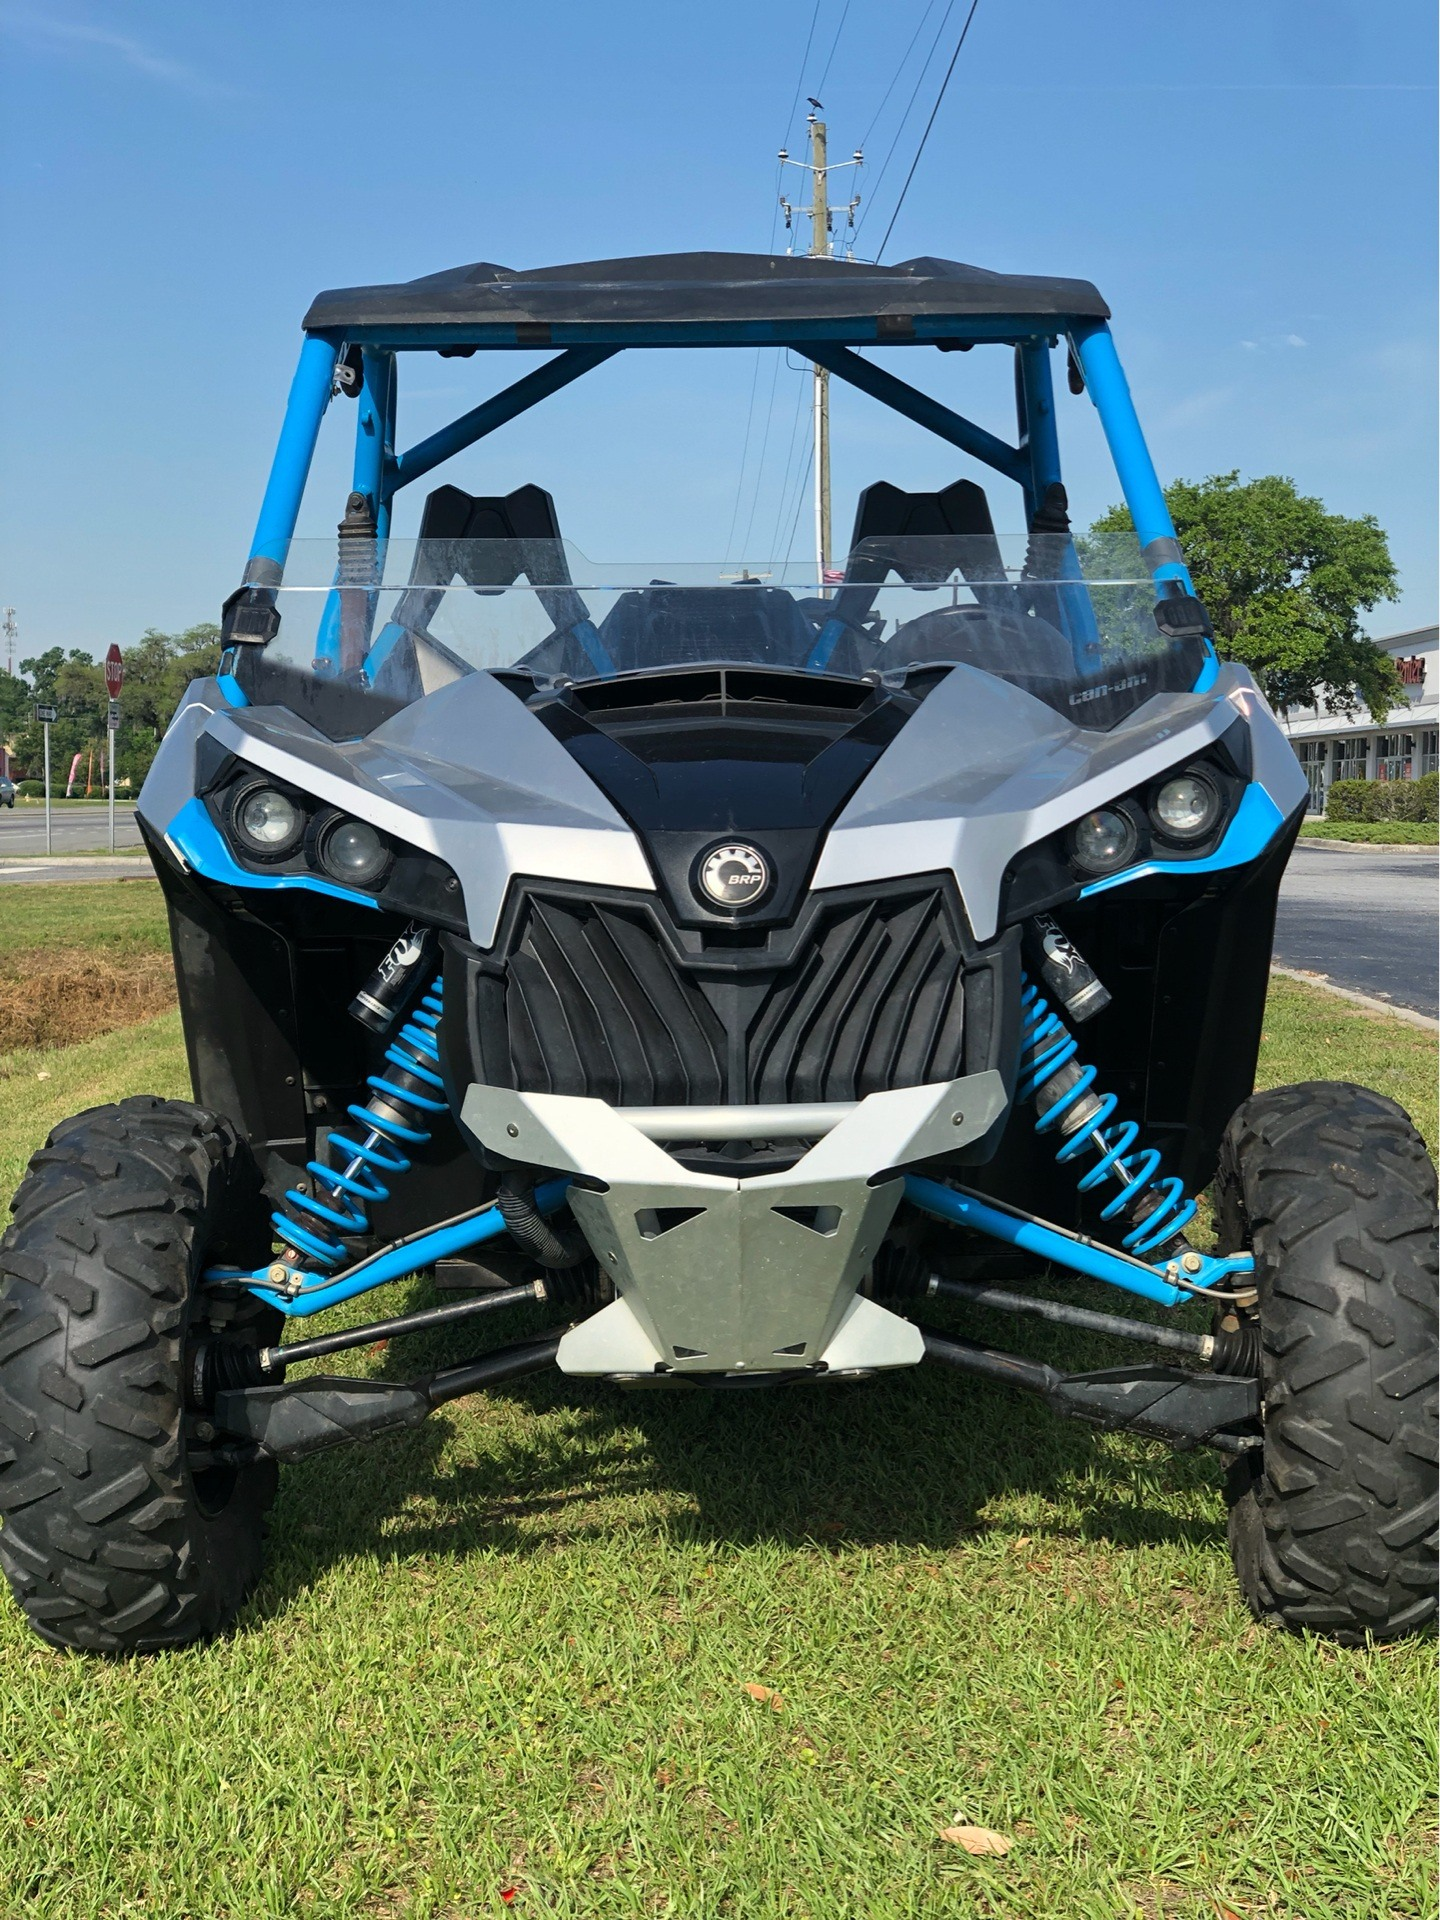 Used Tires Savannah Ga >> Used 2016 Can Am Maverick X Ds Turbo Utility Vehicles In Savannah